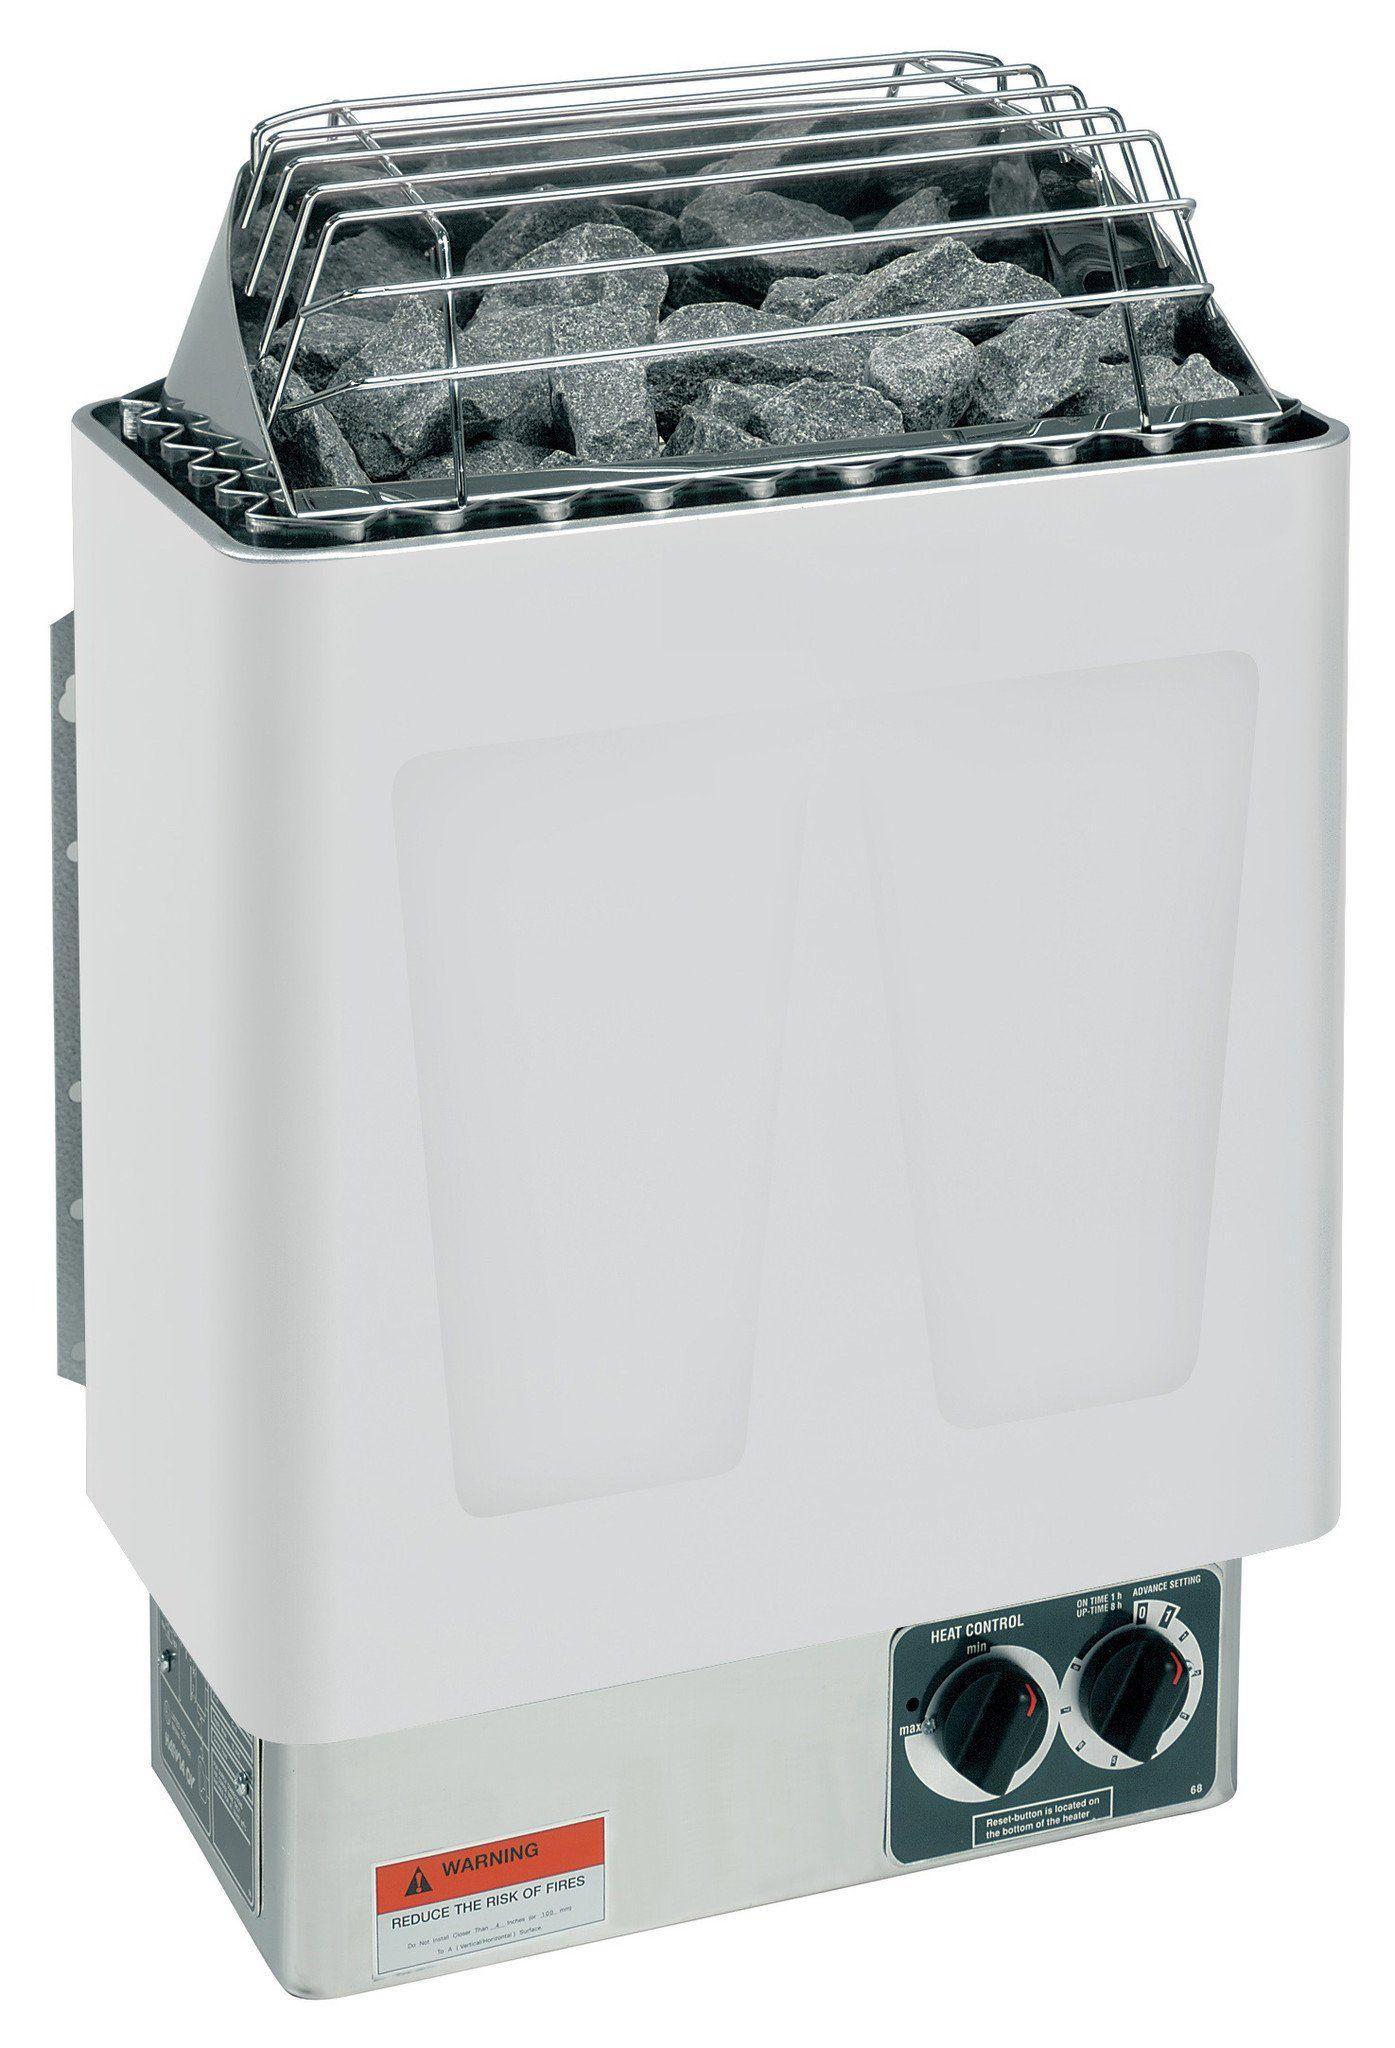 Home Sauna Kits Since 1974 buy harvia kip80b: 8kw 240v sauna heater with built in